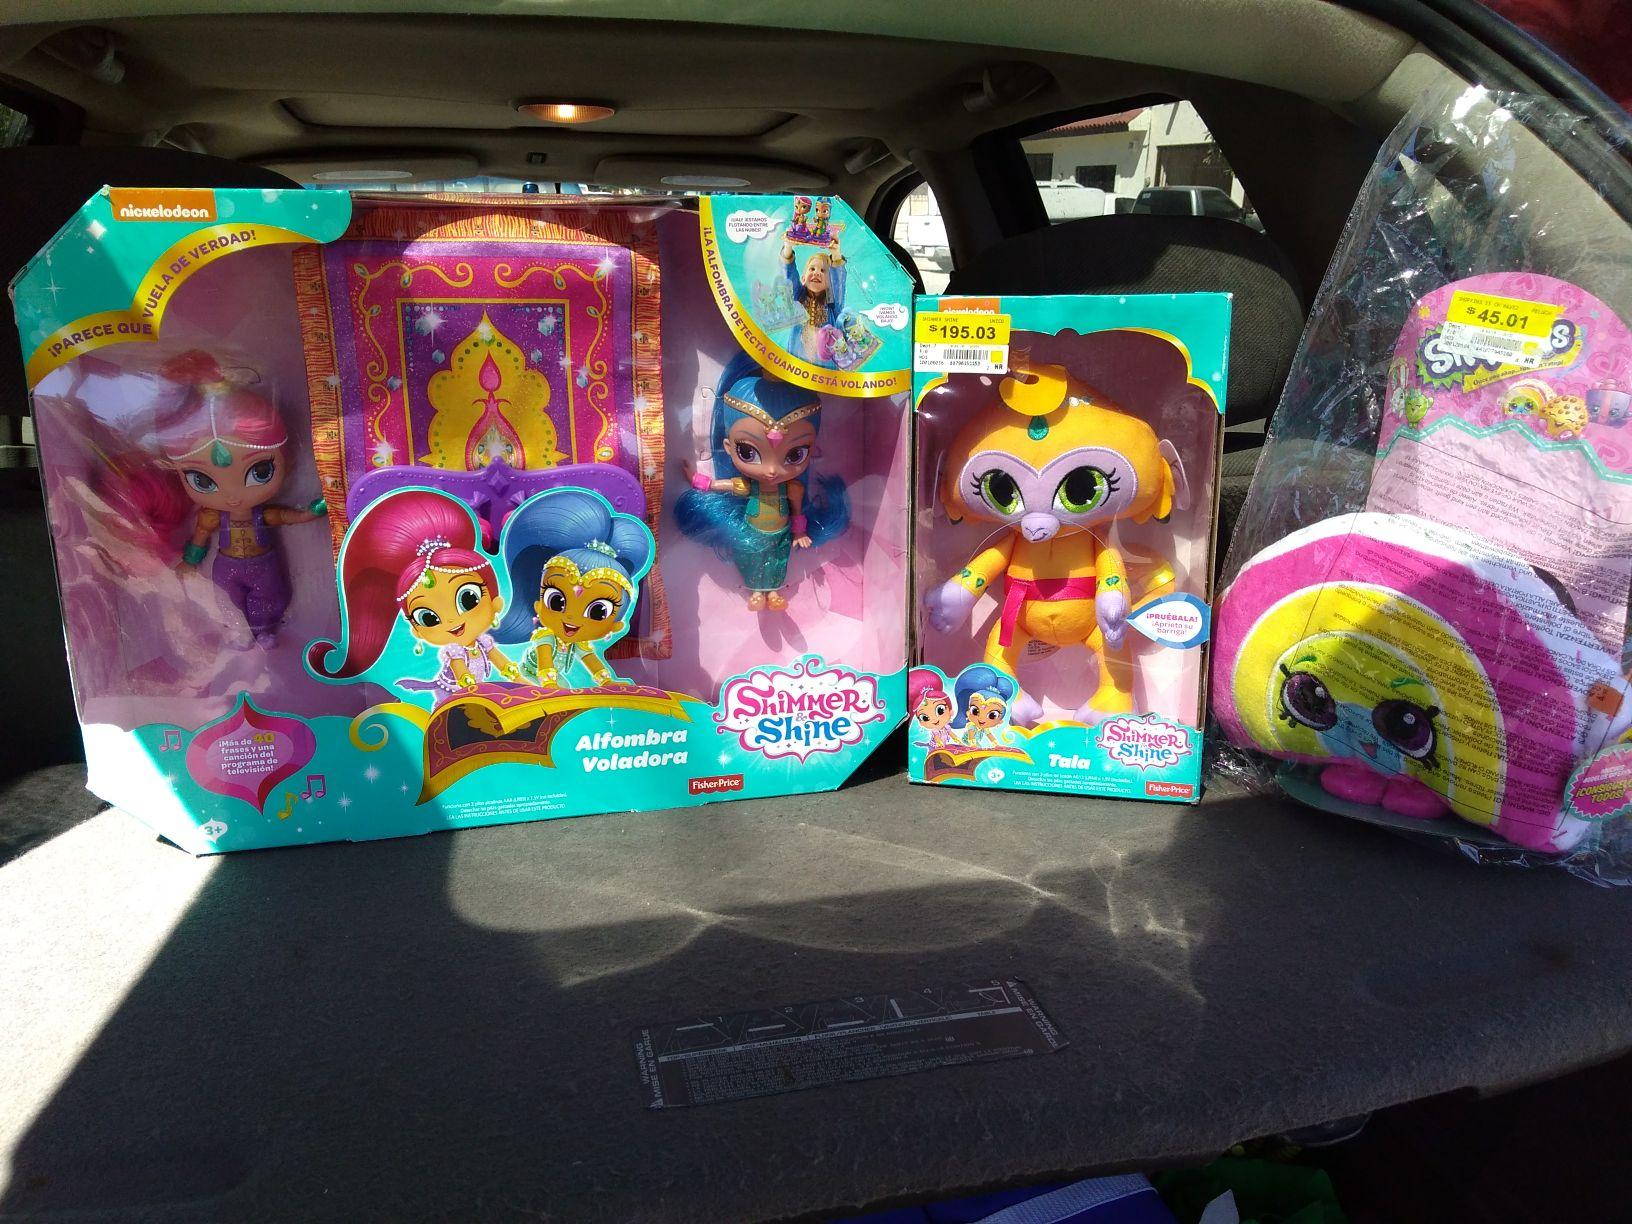 Walmart: juguetes shimer & shine alfombra voladora y muñeca tala